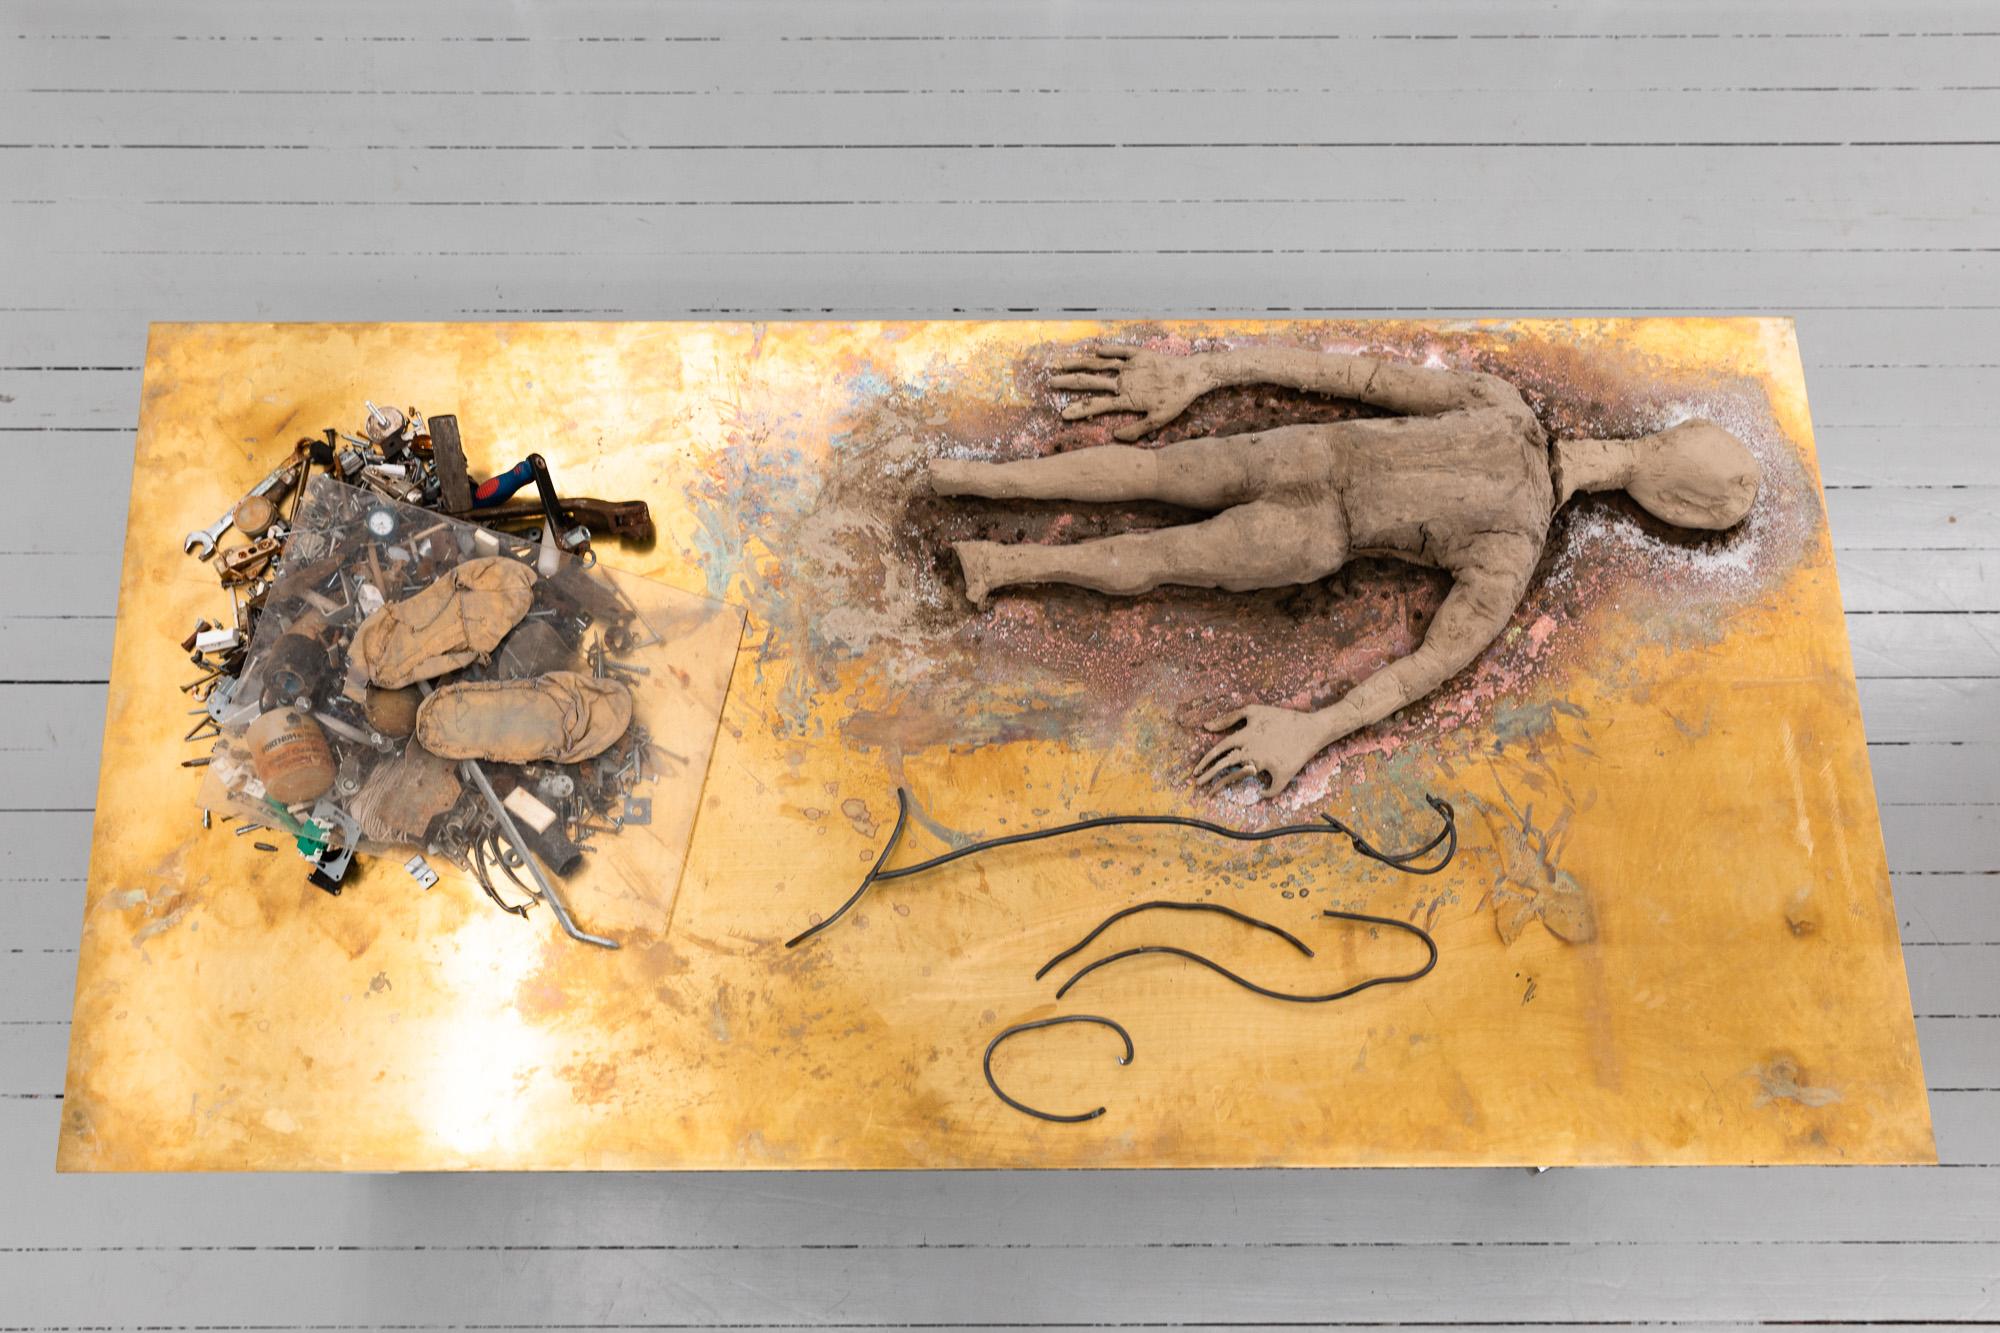 Work Table Roots (Gyökerek), 2020, Mixed media (textile, clay, steel, powder-coated steel, brass, plywood, wheels) on artist designed table, 90 x 200 x 100 cm (table)